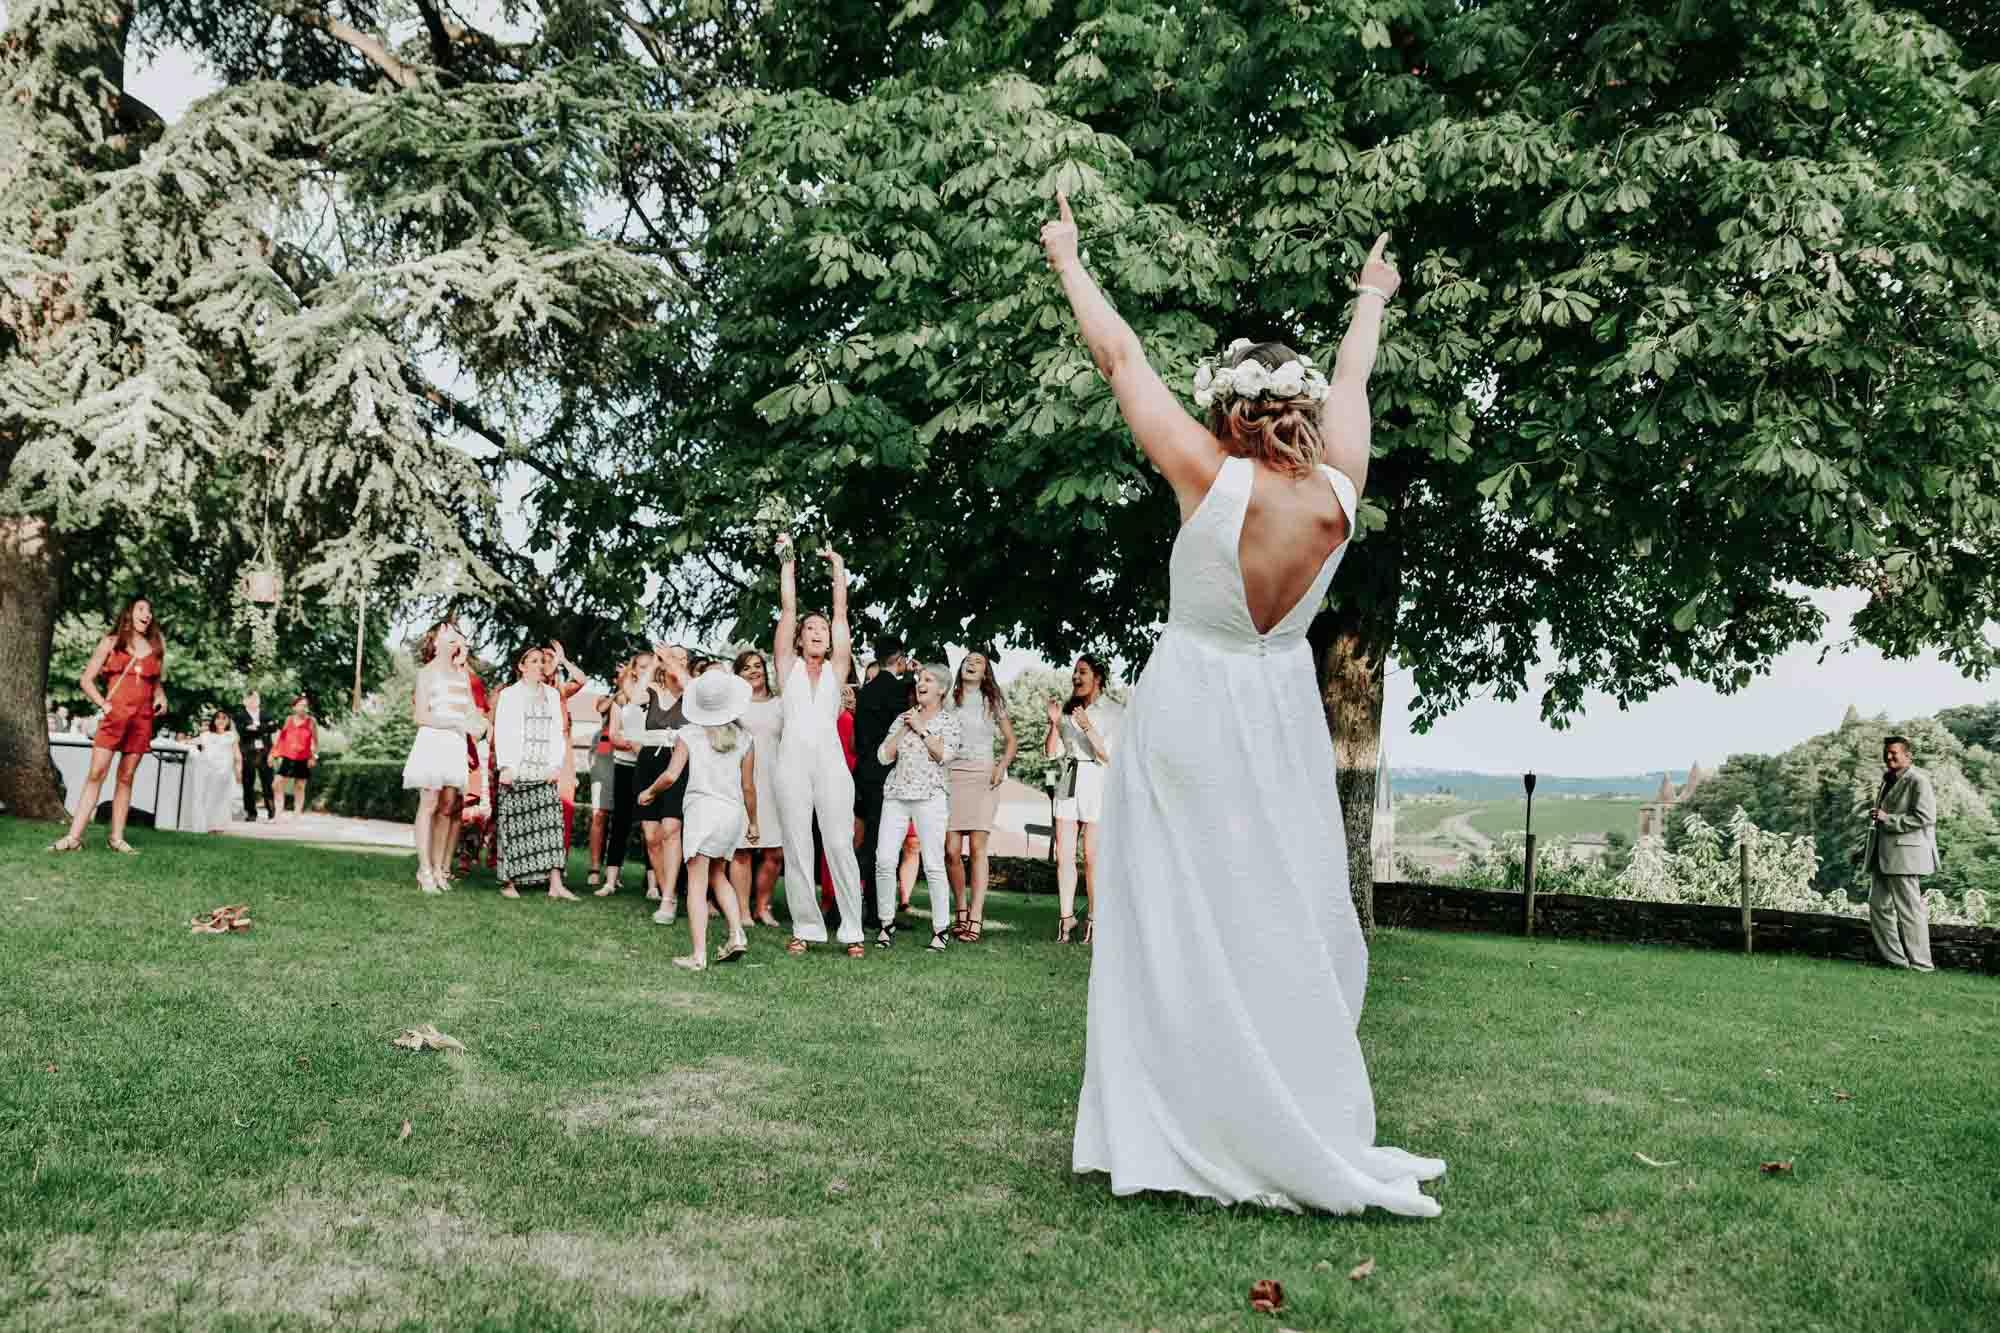 2018-07-21 - LD8_0632 - photographe mariage lyon - laurie diaz - www.lauriediazweeding.com.jpg